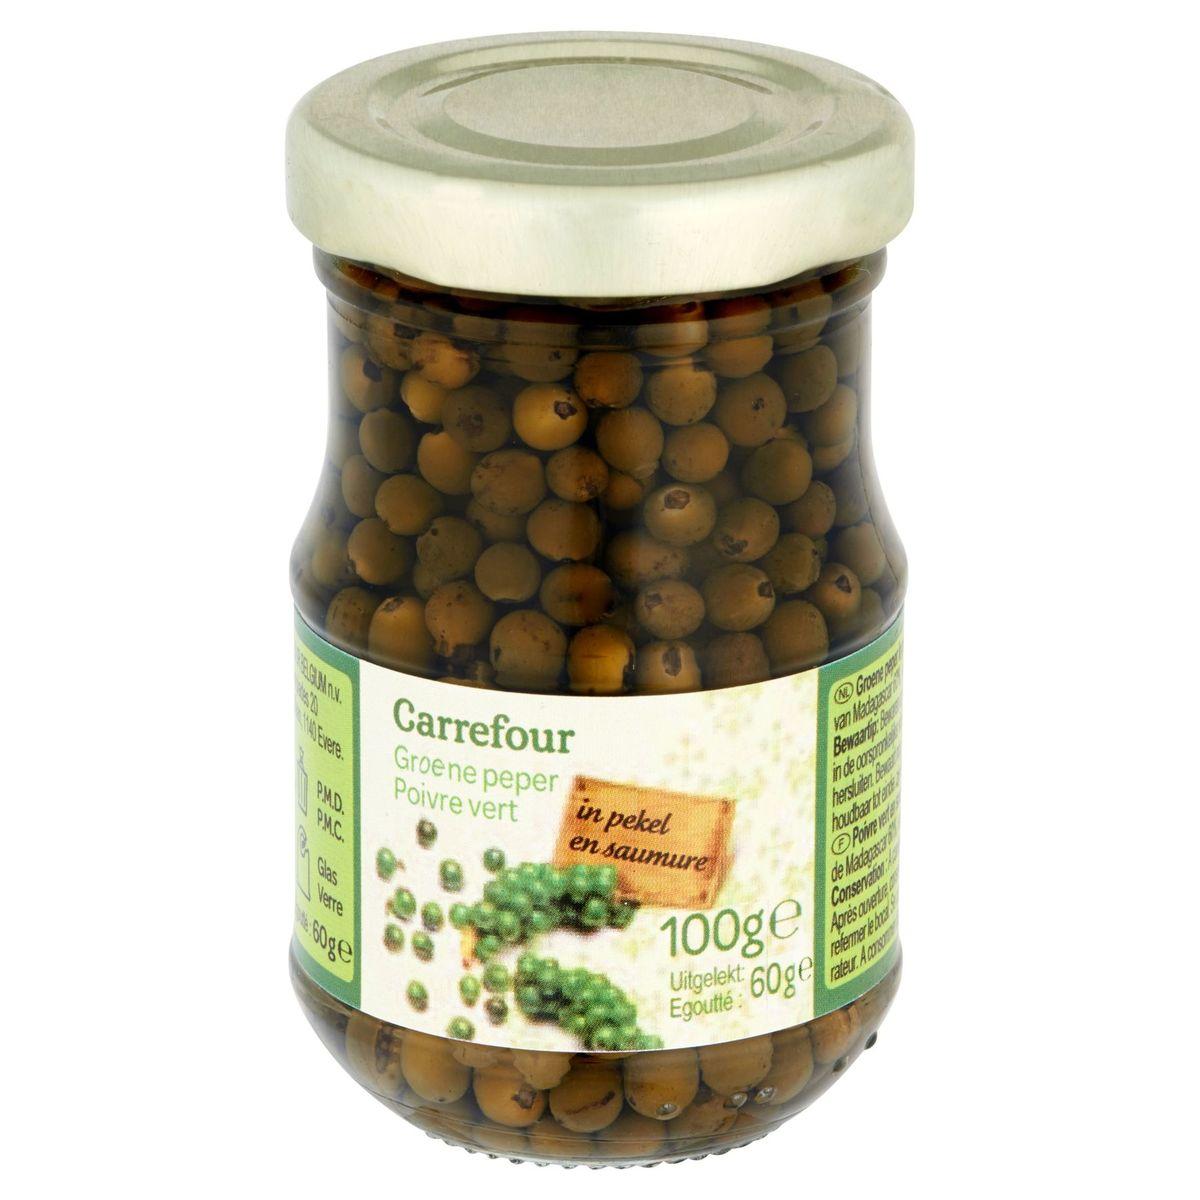 Carrefour Groene Peper in Pekel 100 g